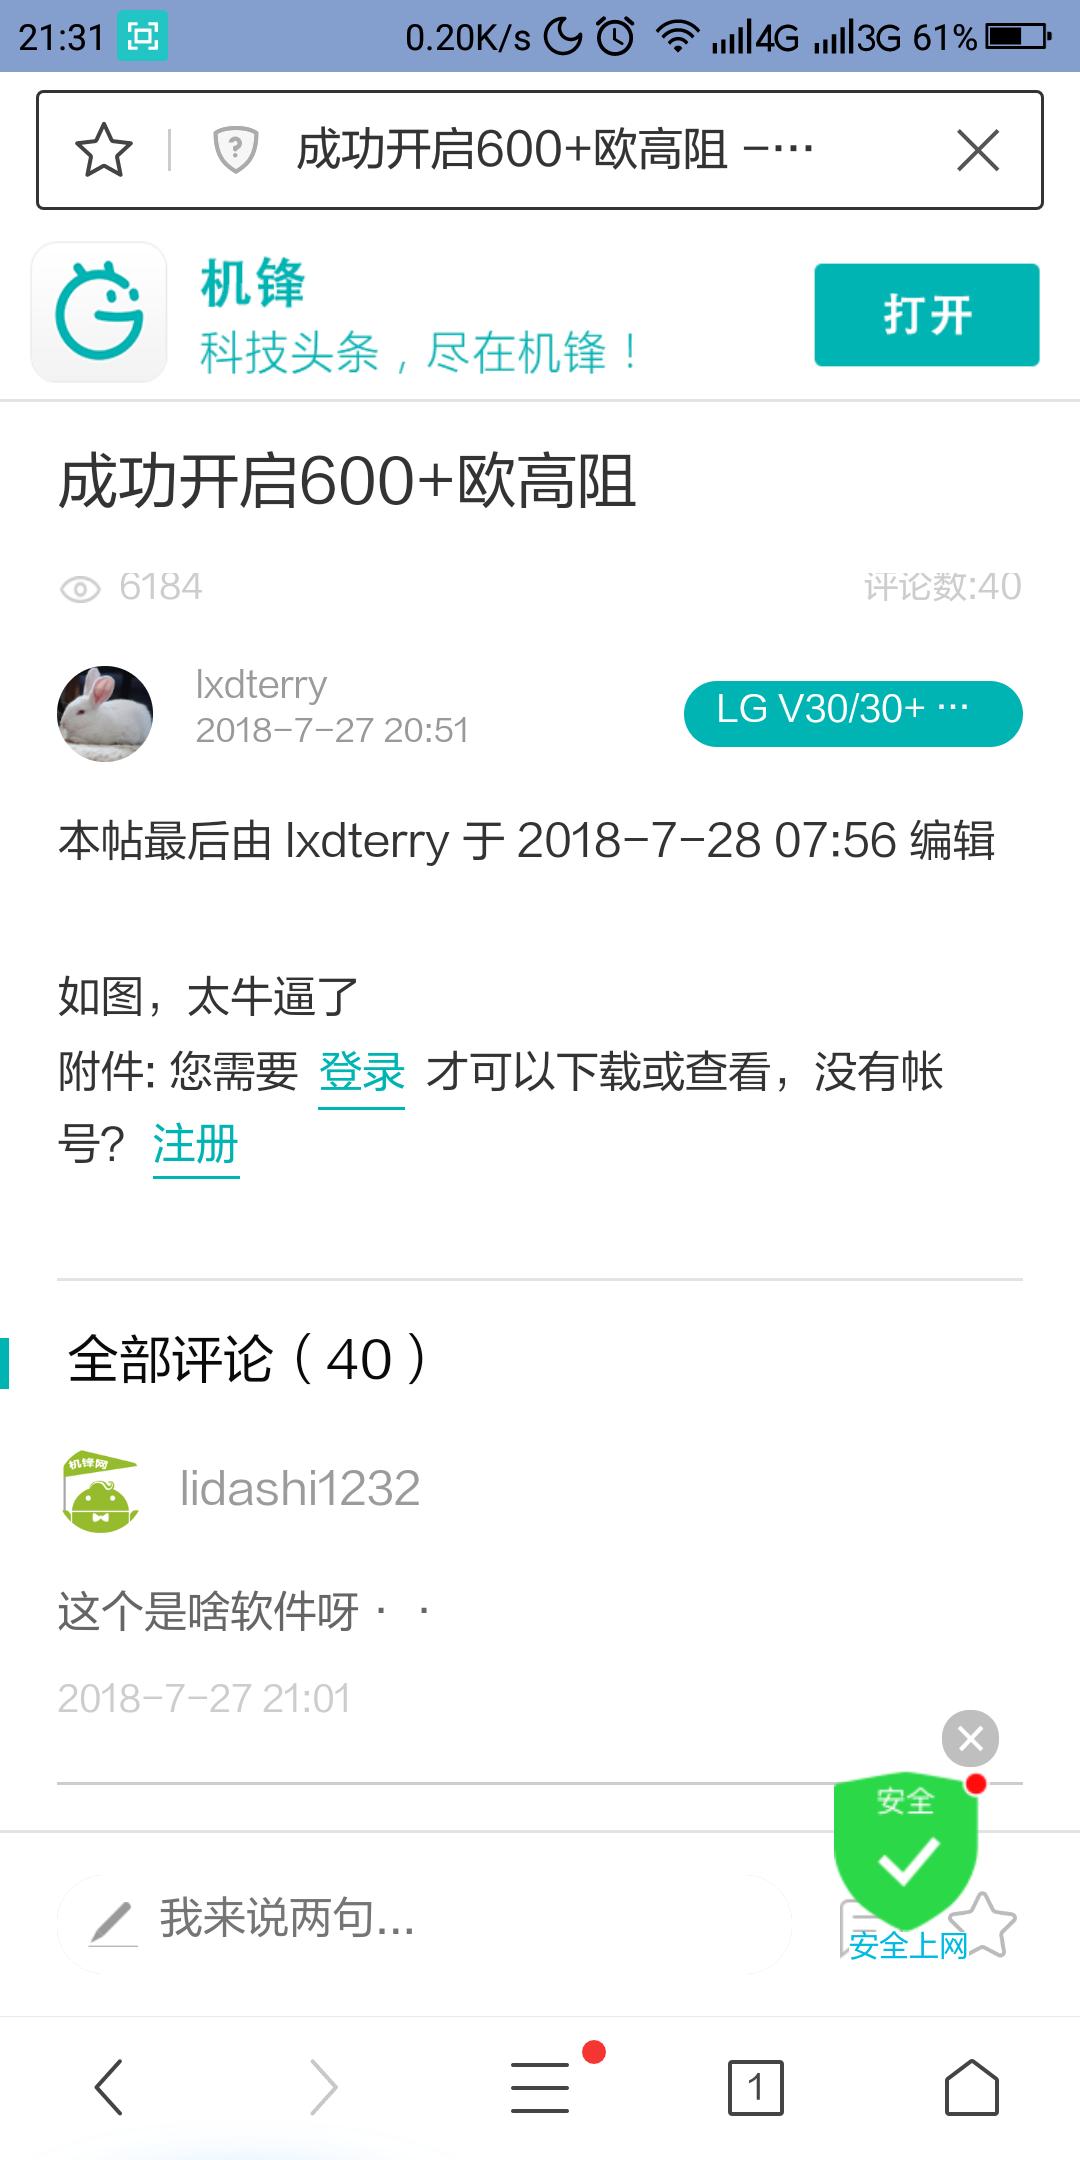 Screenshot_2018-12-14-21-31-34.png